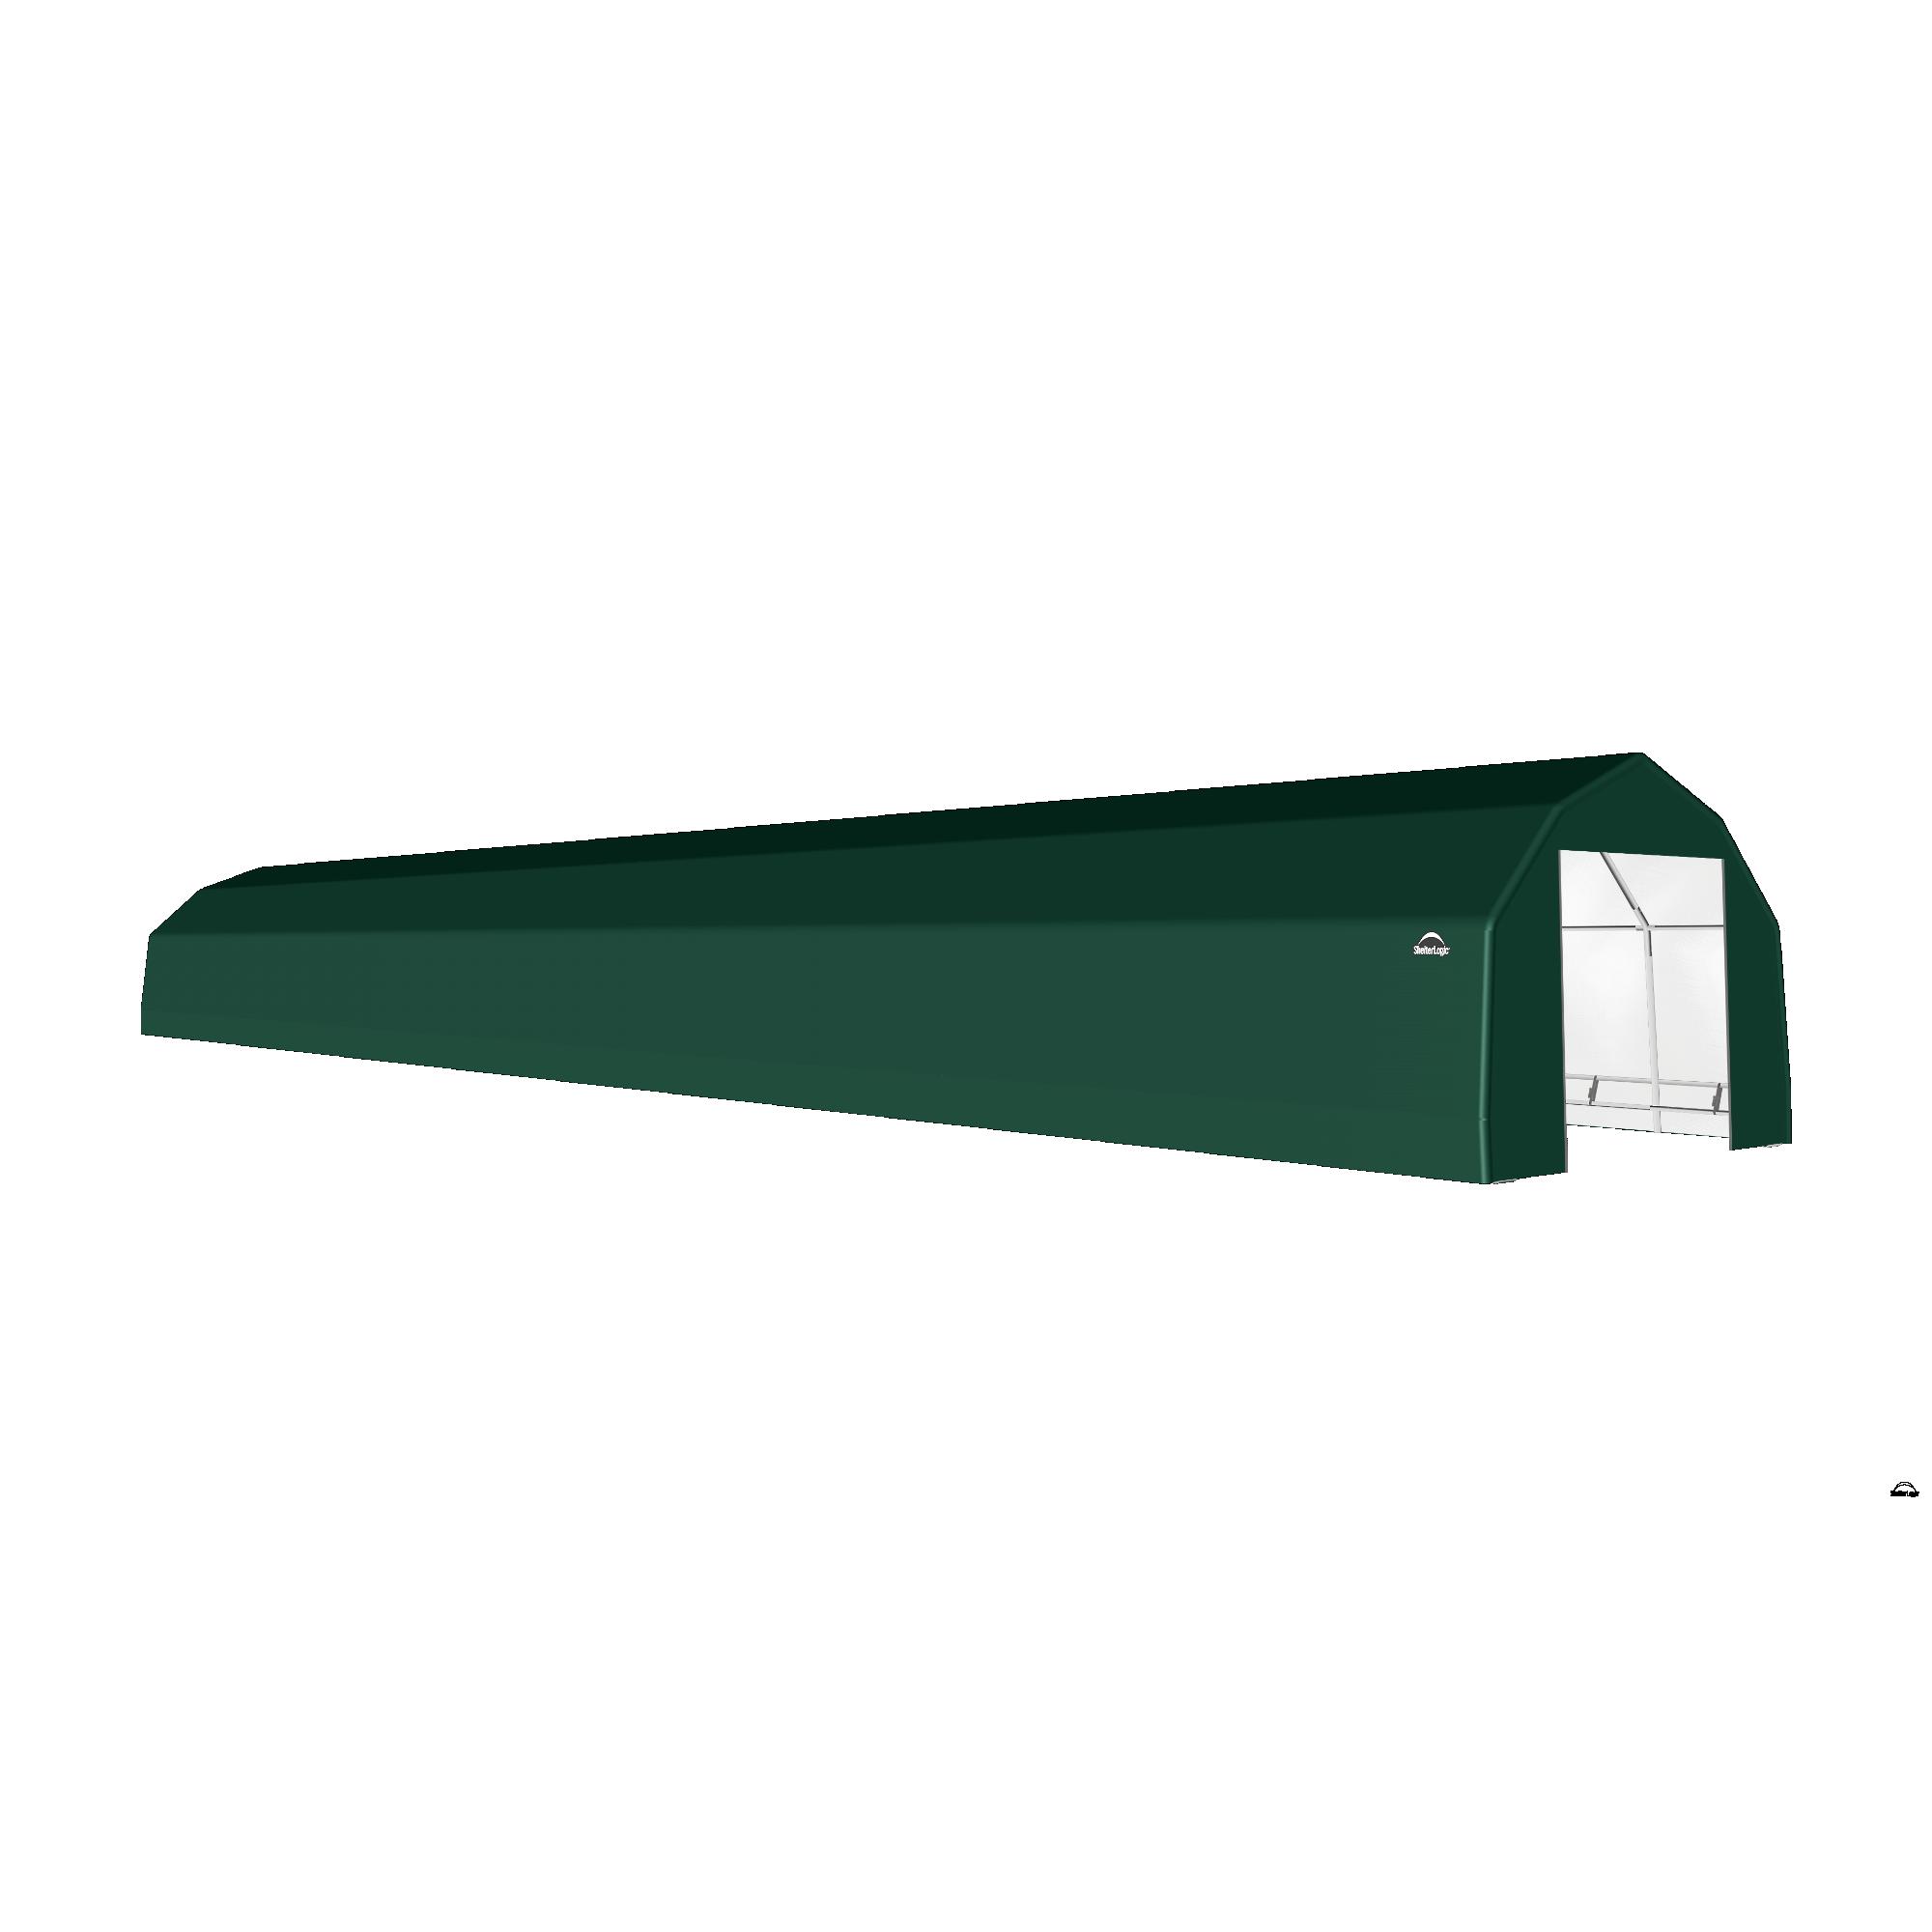 SP Barn 15X96X11 Green 14 oz PE Shelter